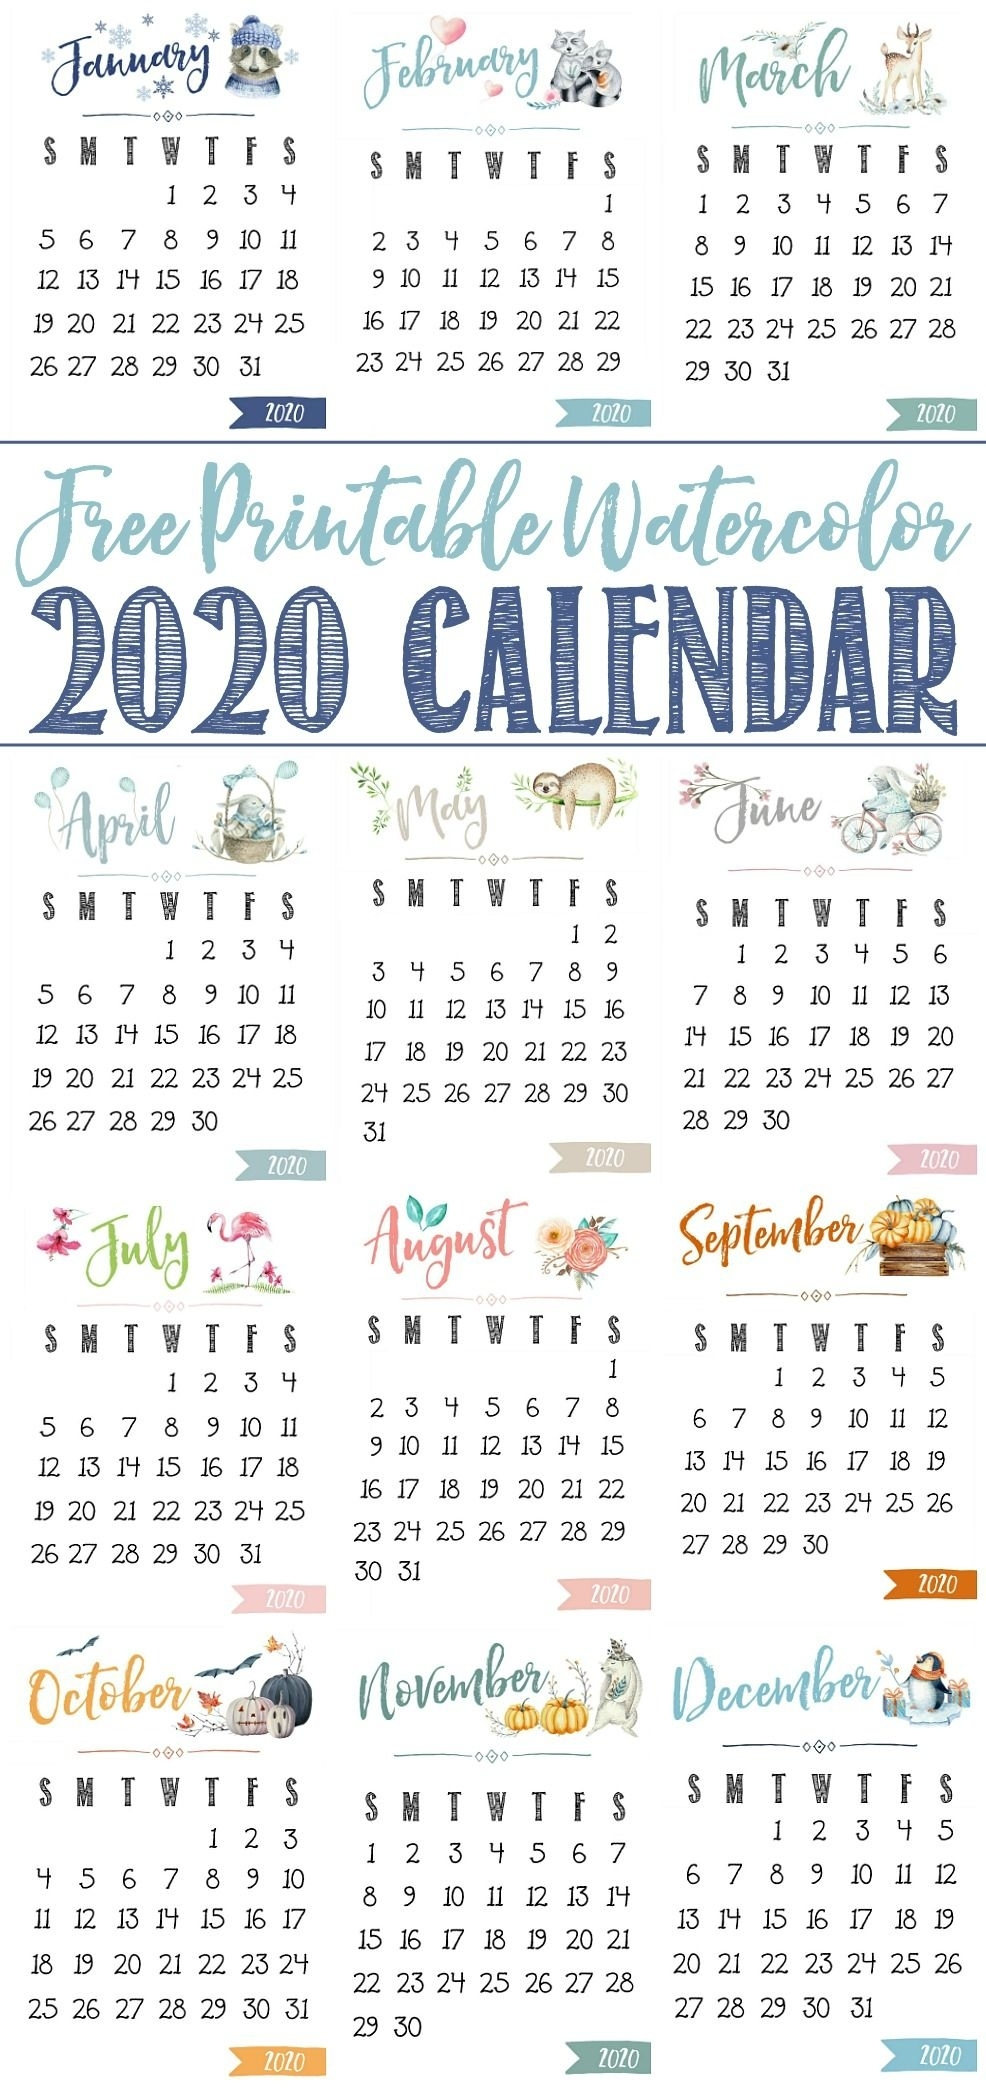 Free Printable 2020 Calendar | Free Printable Calendar, Free